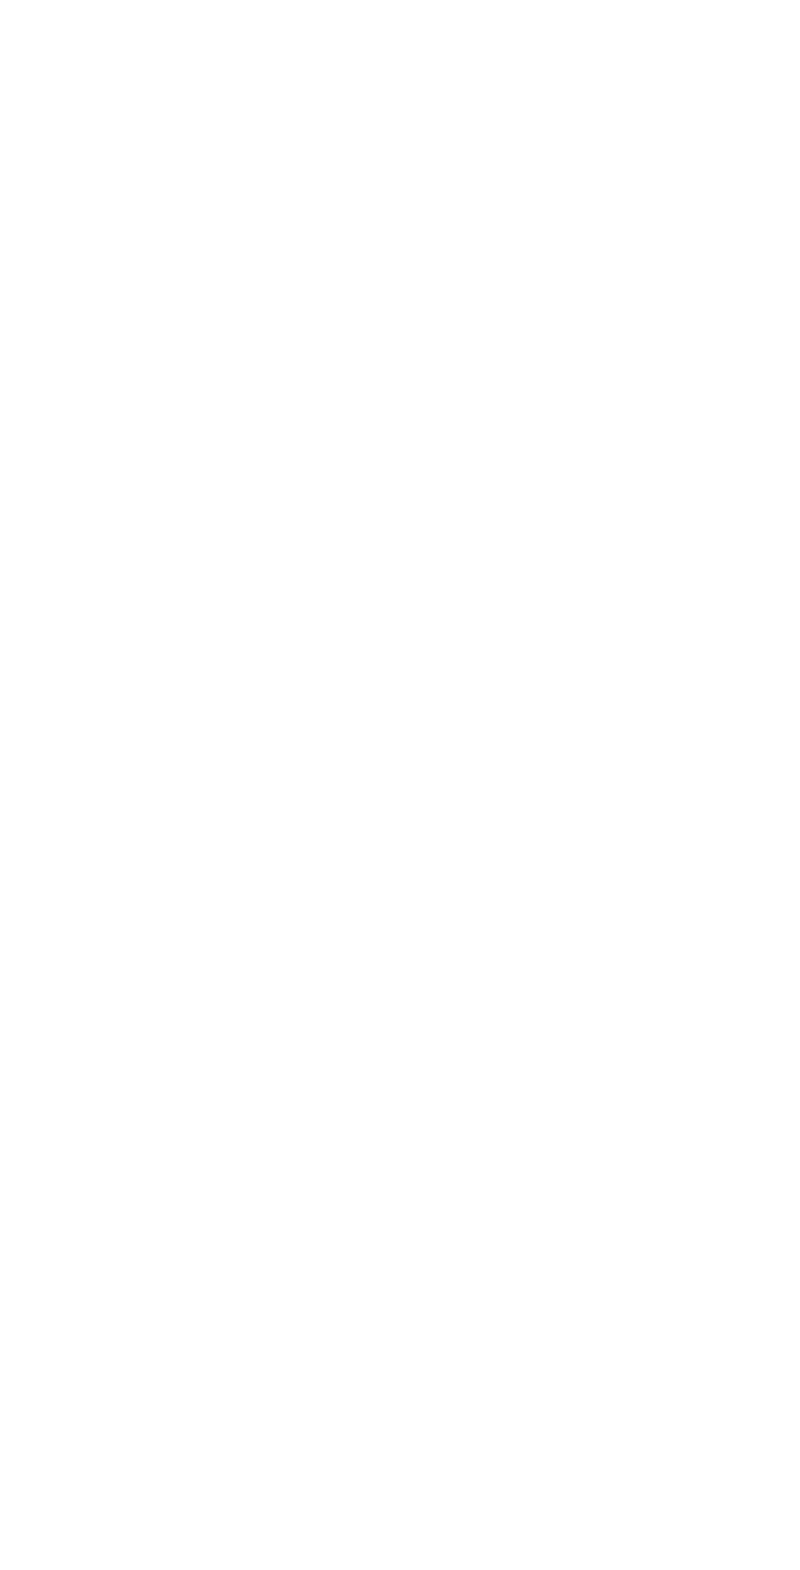 Knights of Malta - Richmond Virginia Brewery